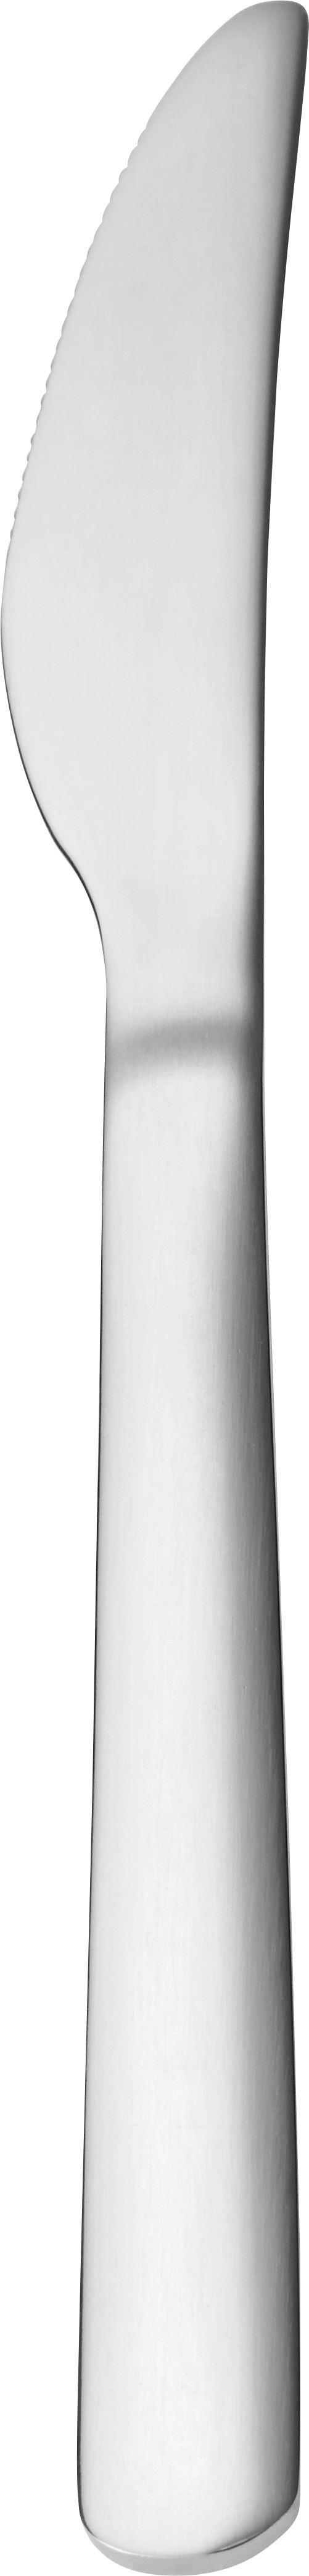 Messer Demi Edelstahl - Edelstahlfarben, KONVENTIONELL, Metall (21cm) - Mömax modern living